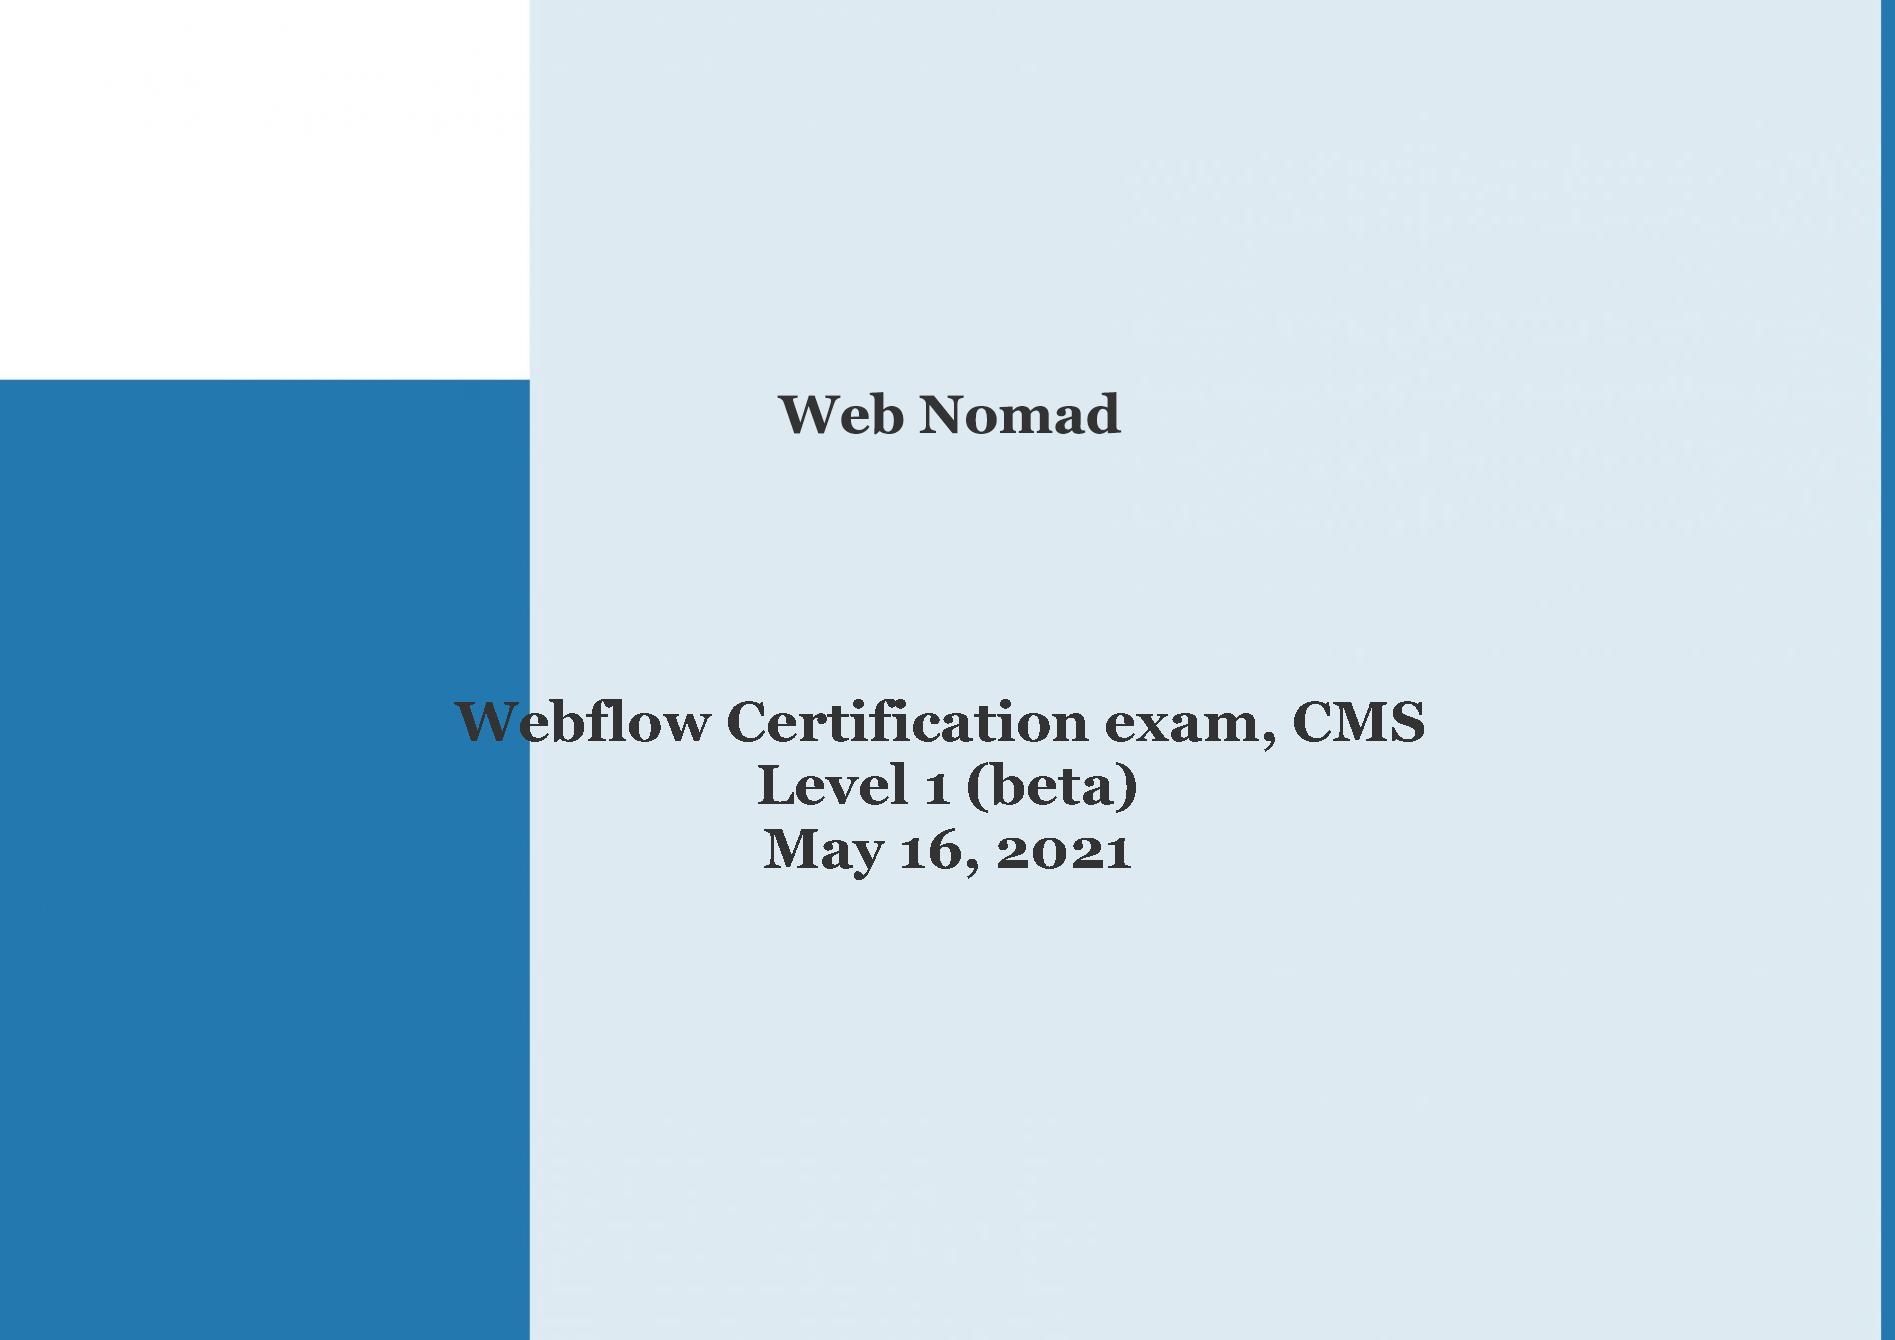 Web Nomad Certification 1